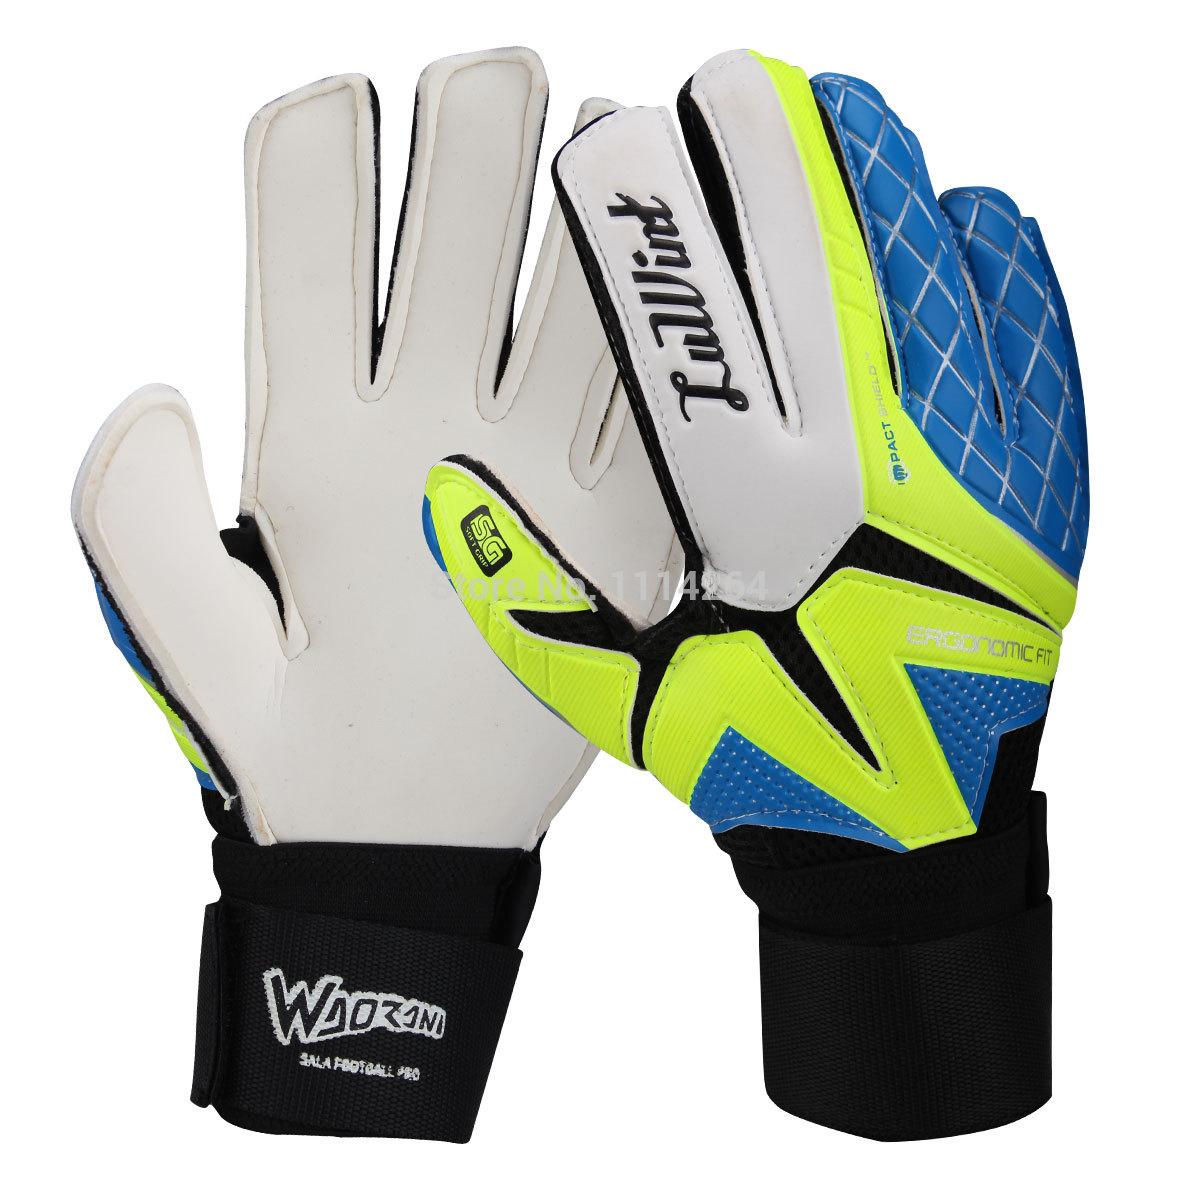 Luwint goalkeeper gloves goalkeeper gloves football gloves slip-resistant breathable Free shipping size 8,9,10(China (Mainland))